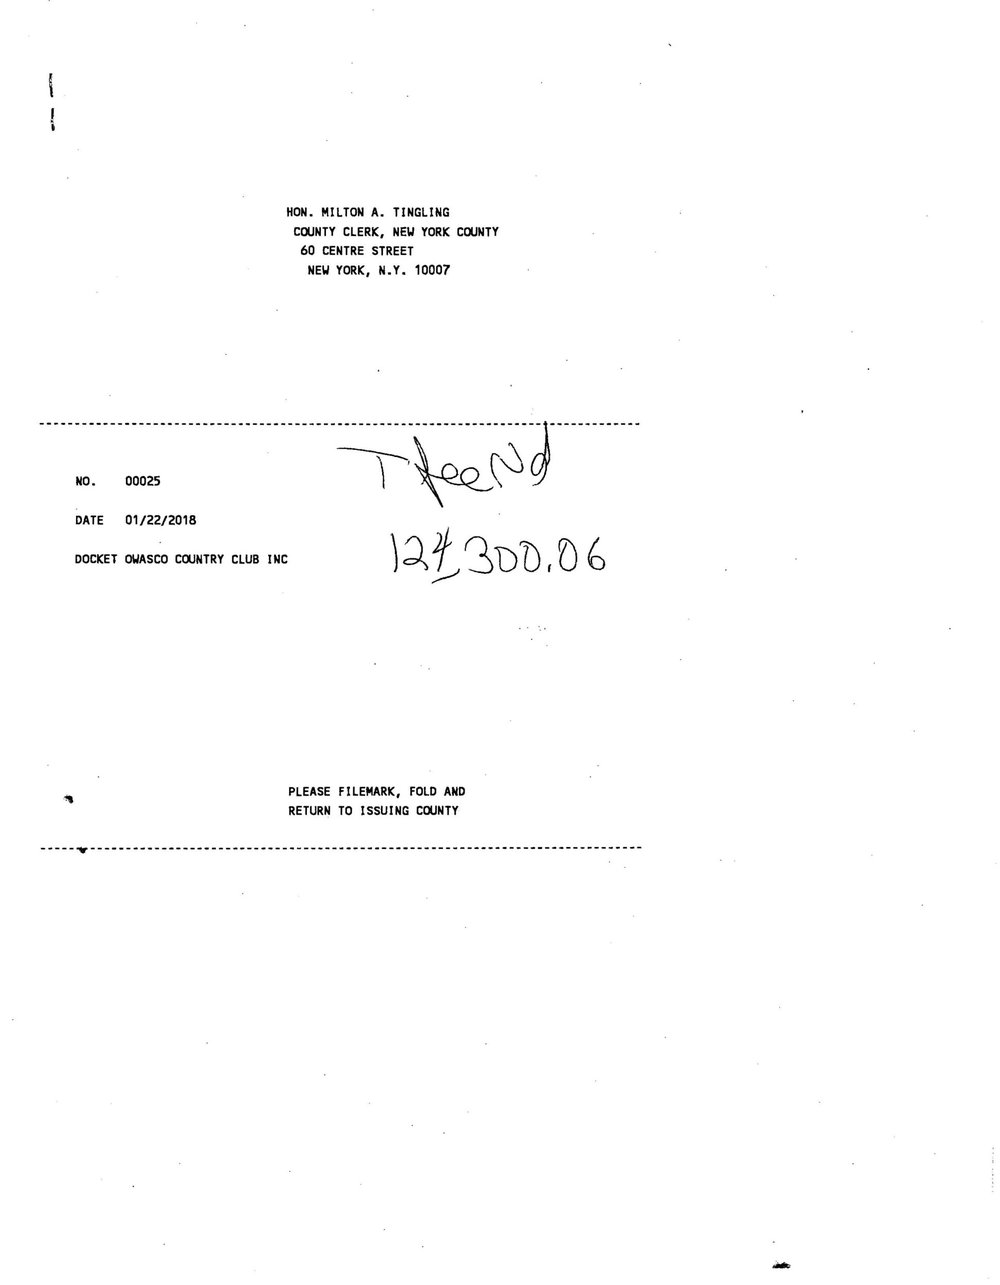 Transcript of Judgment (Michael DeRosa Exchange, LLC vs Owasco Country Club, Inc.)_Page_3.jpg